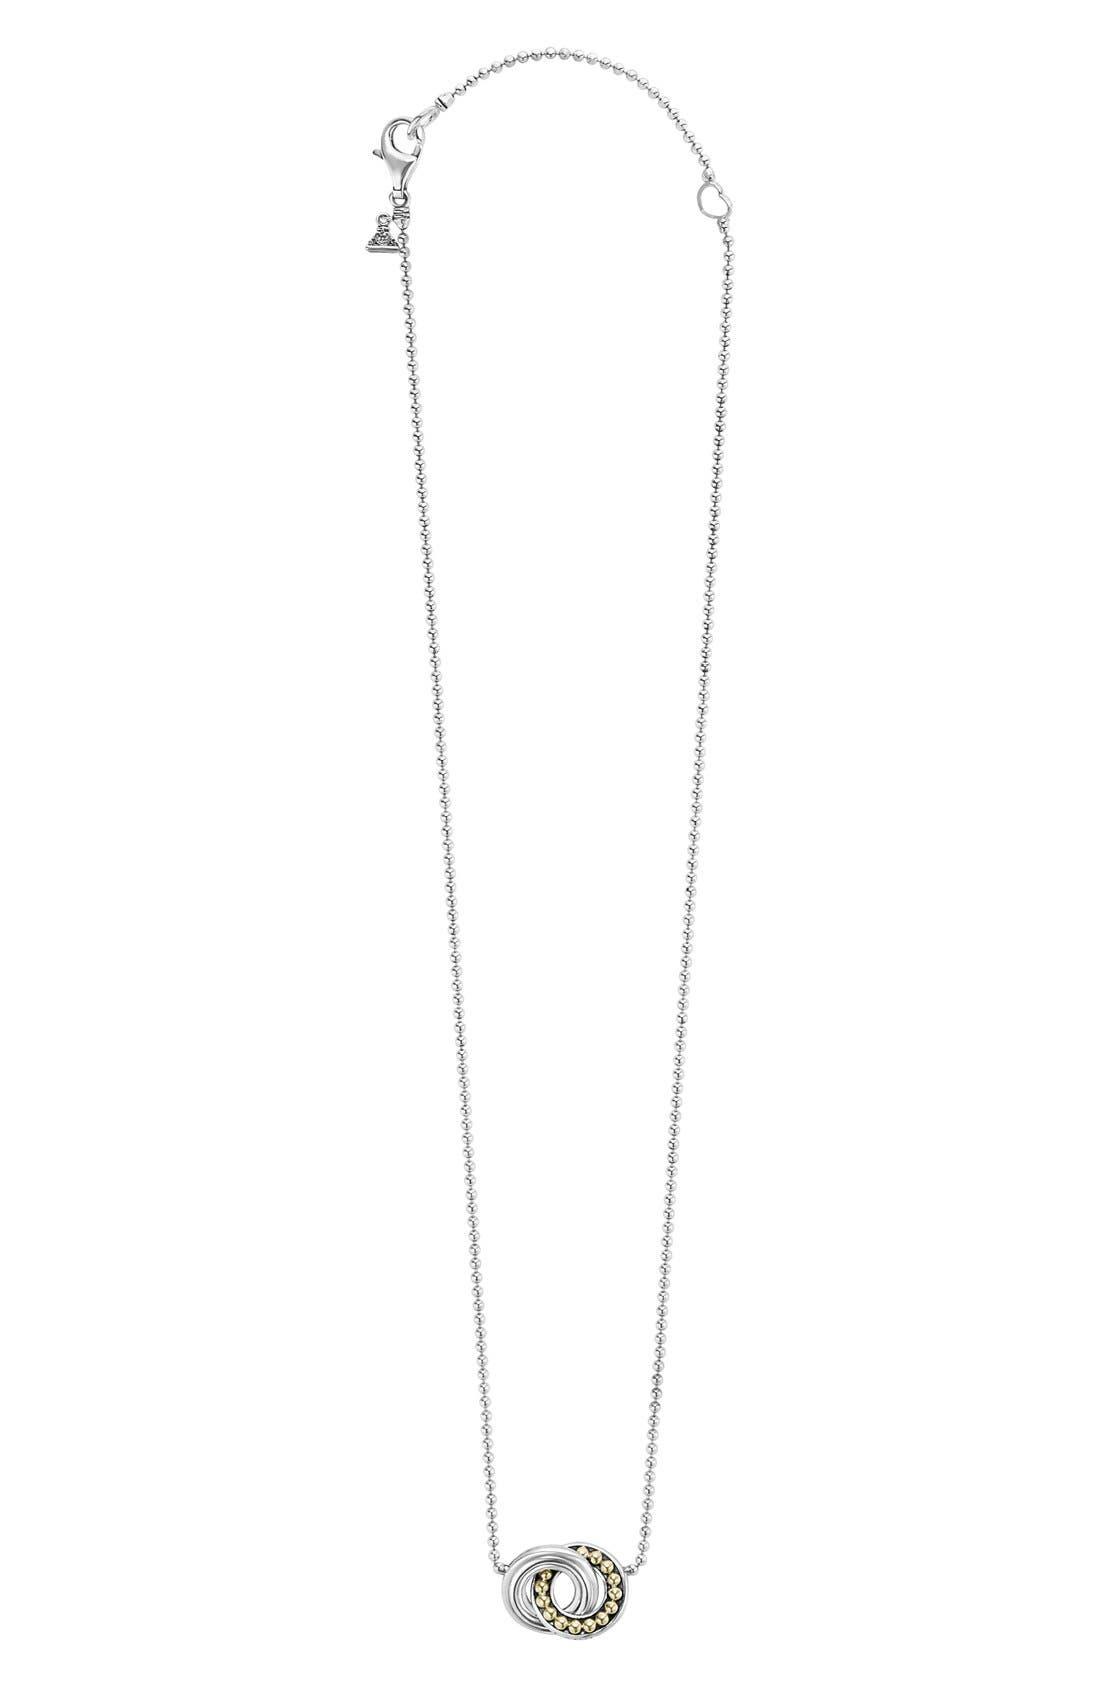 Enso Pendant Necklace,                             Alternate thumbnail 3, color,                             SILVER/ PEARL